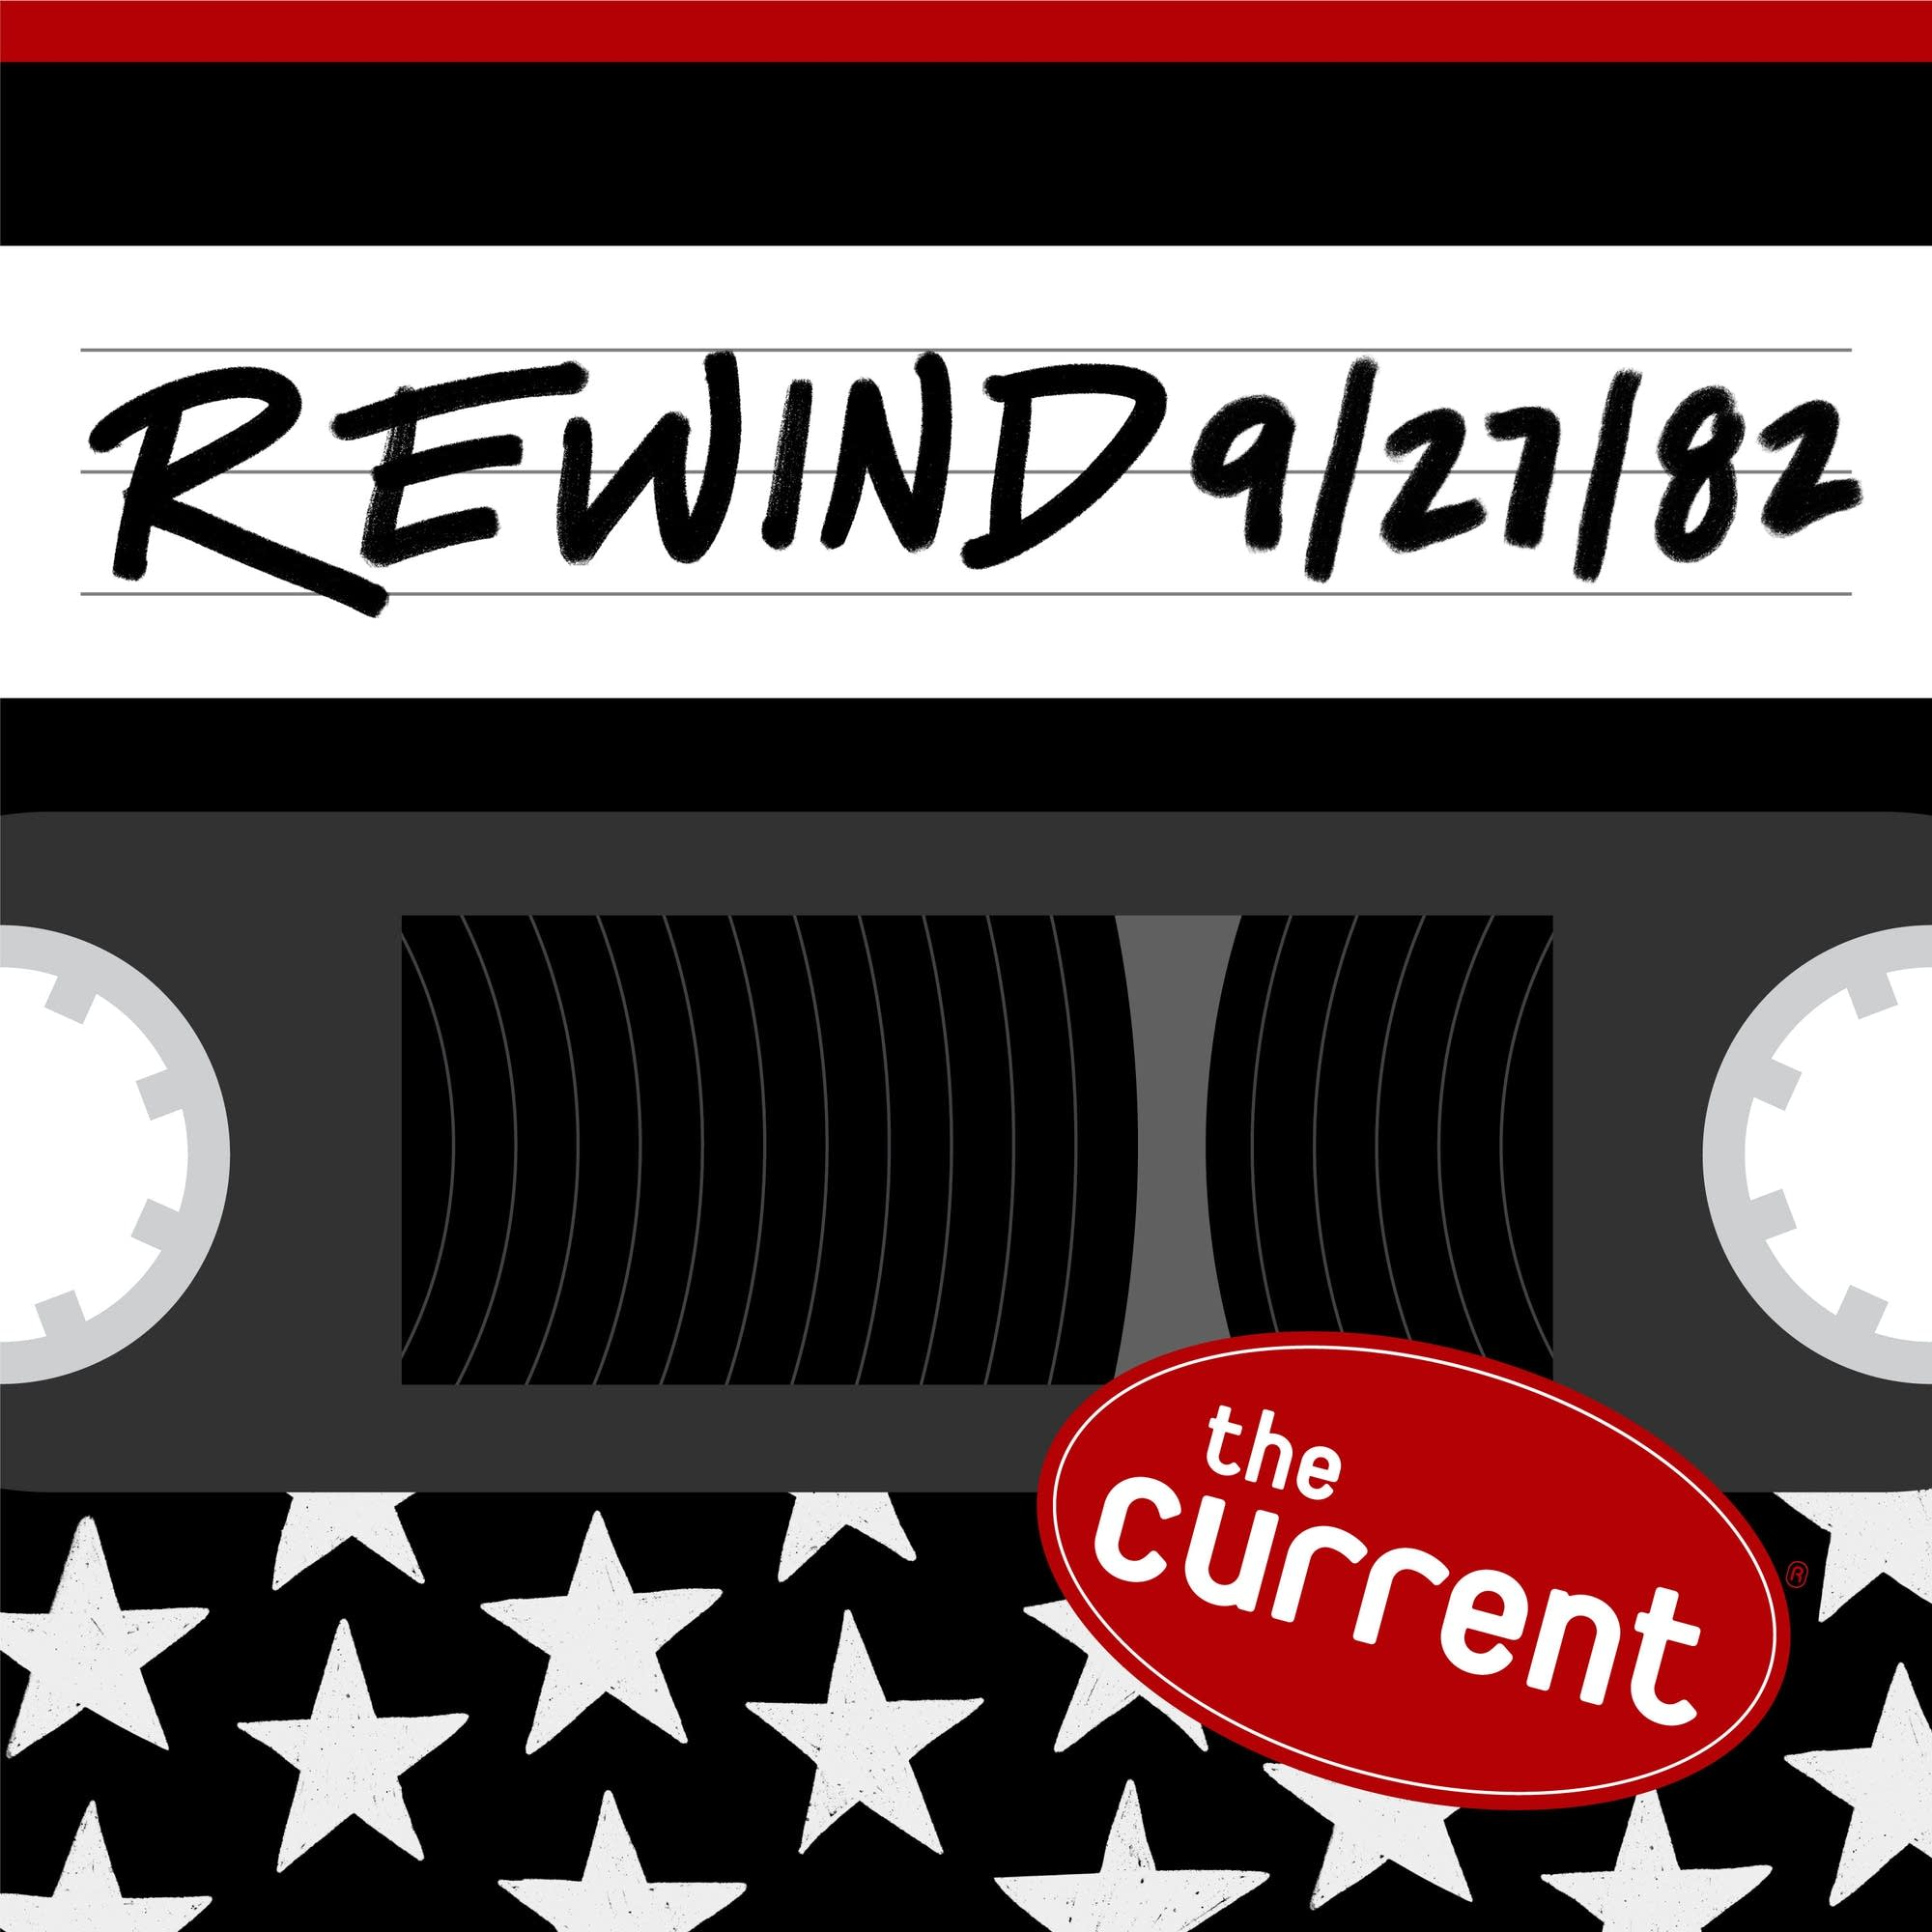 The Current Rewind: 9/27/82